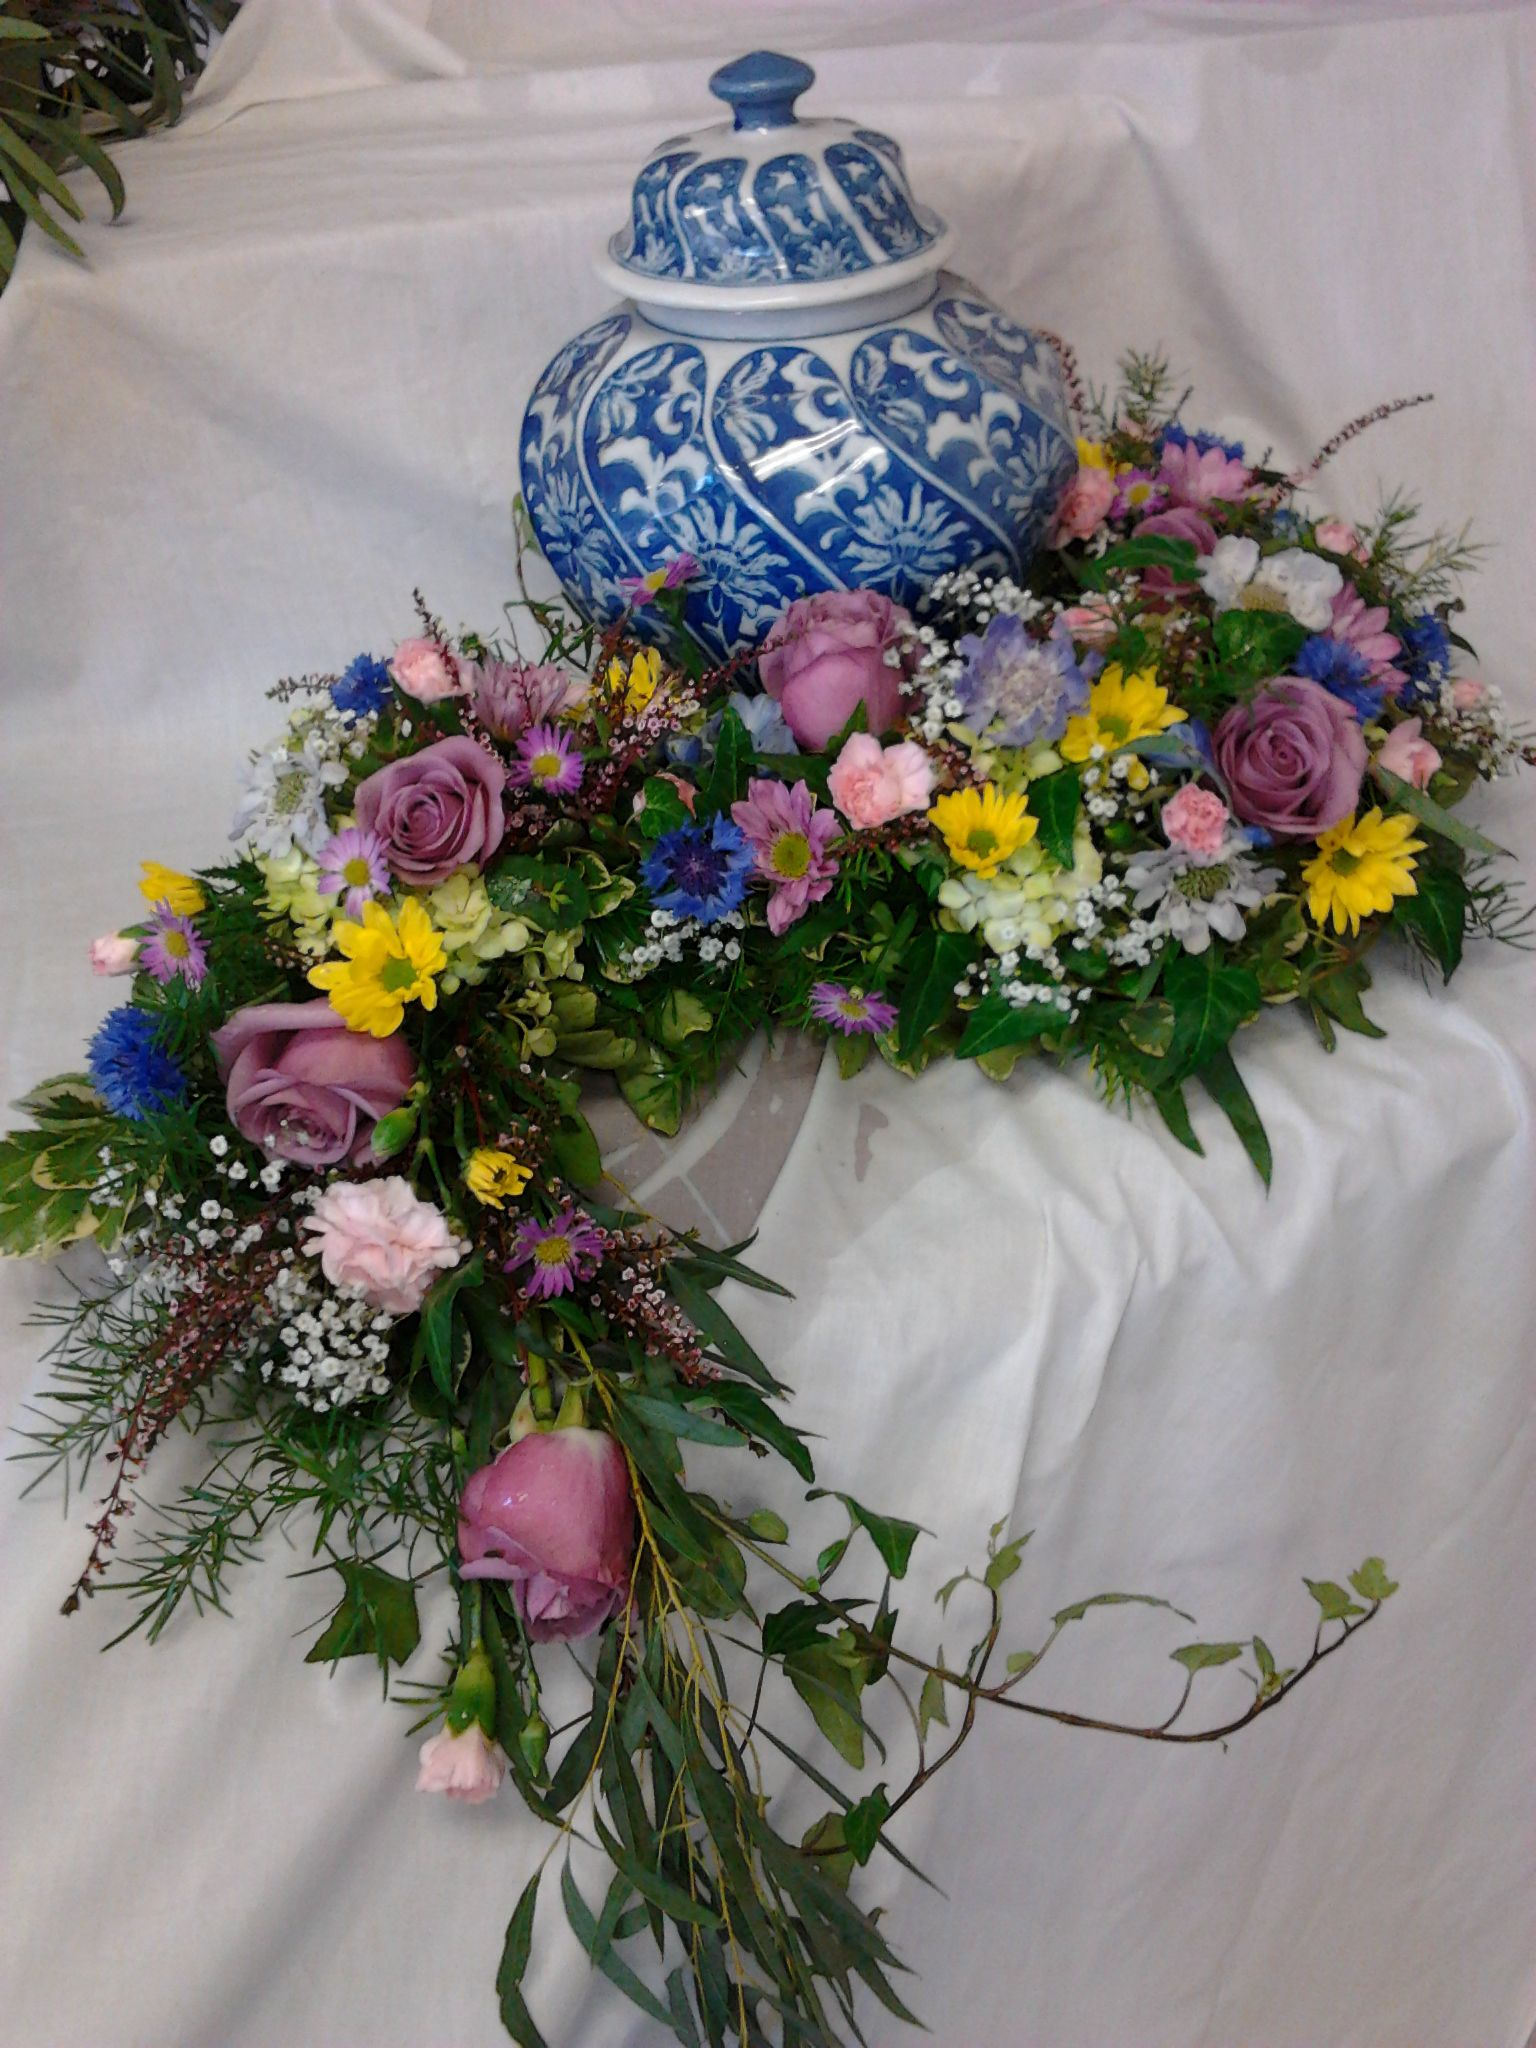 Custom funeral flowers floral options pinterest funeral custom funeral flowers izmirmasajfo